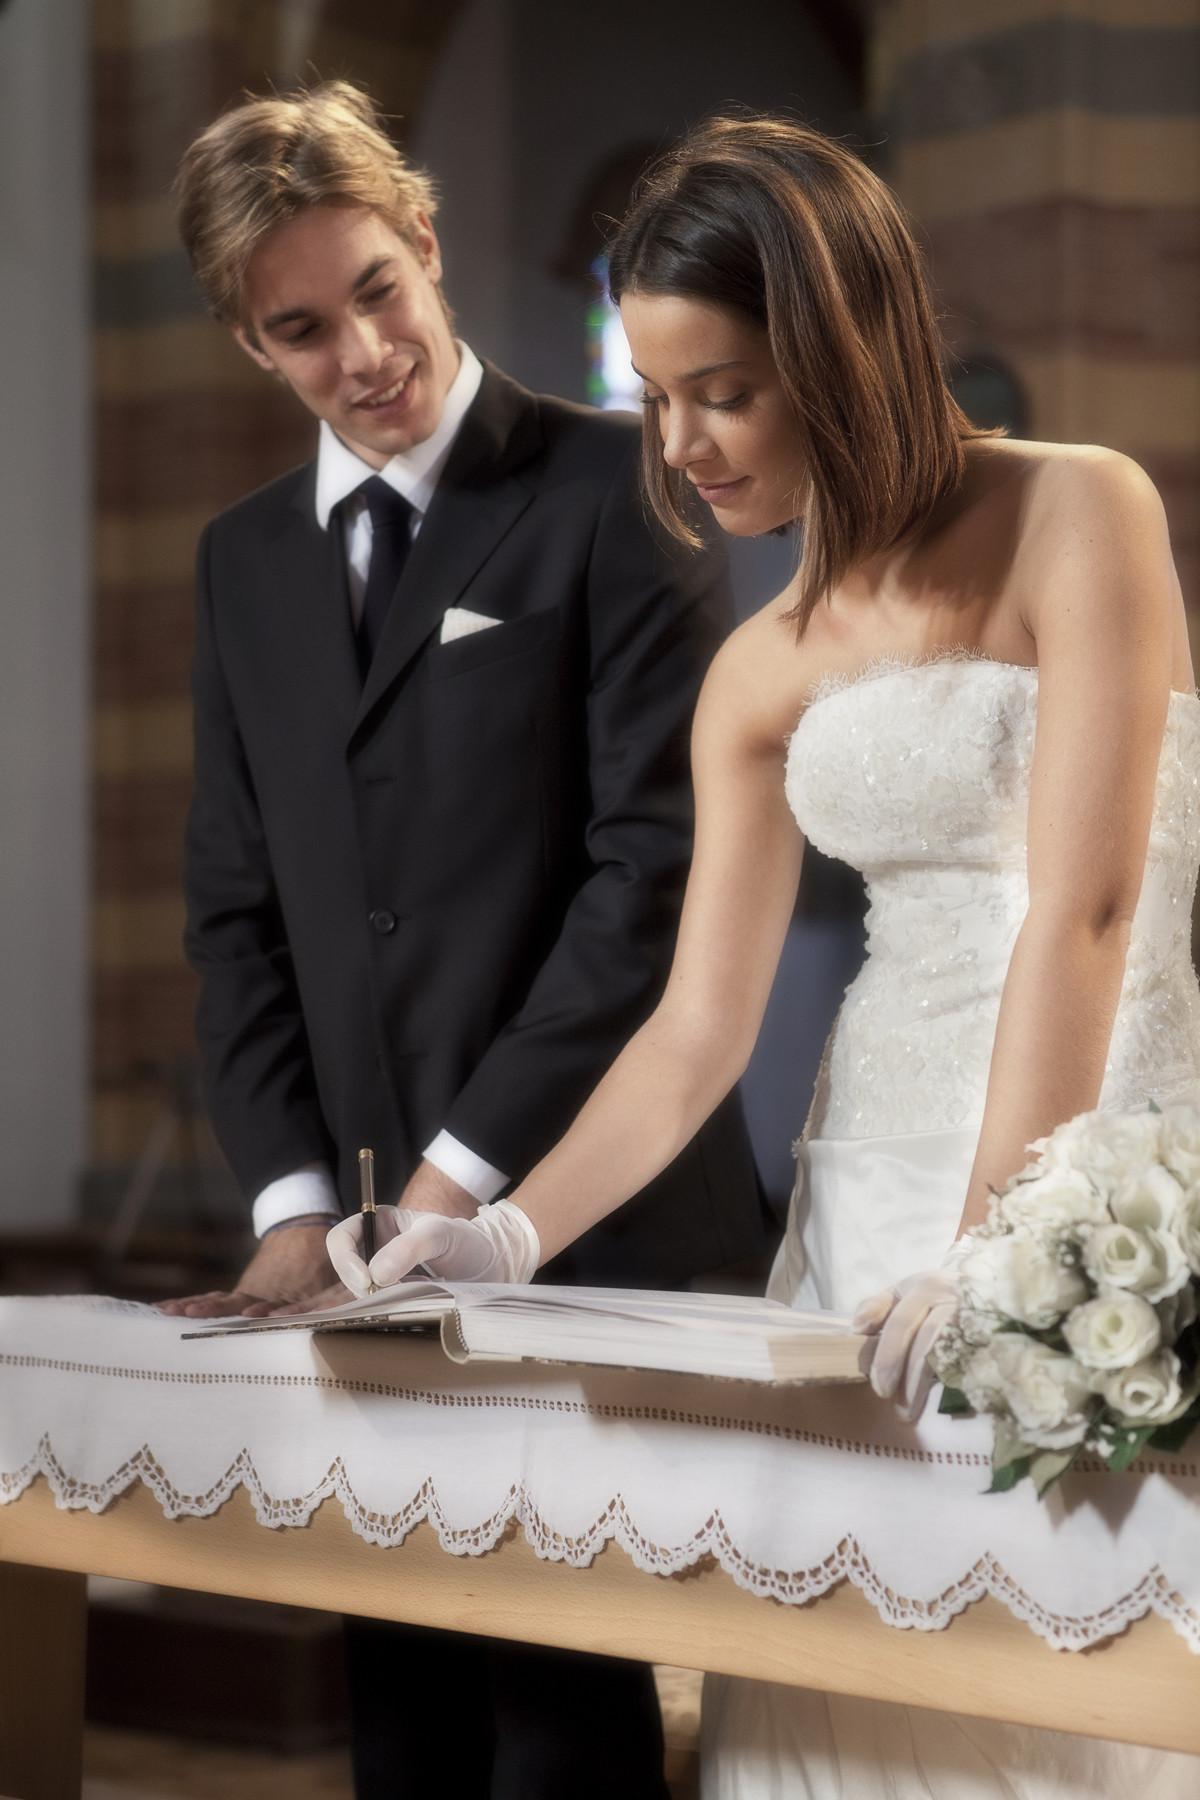 matrimonio 5 firme.jpg